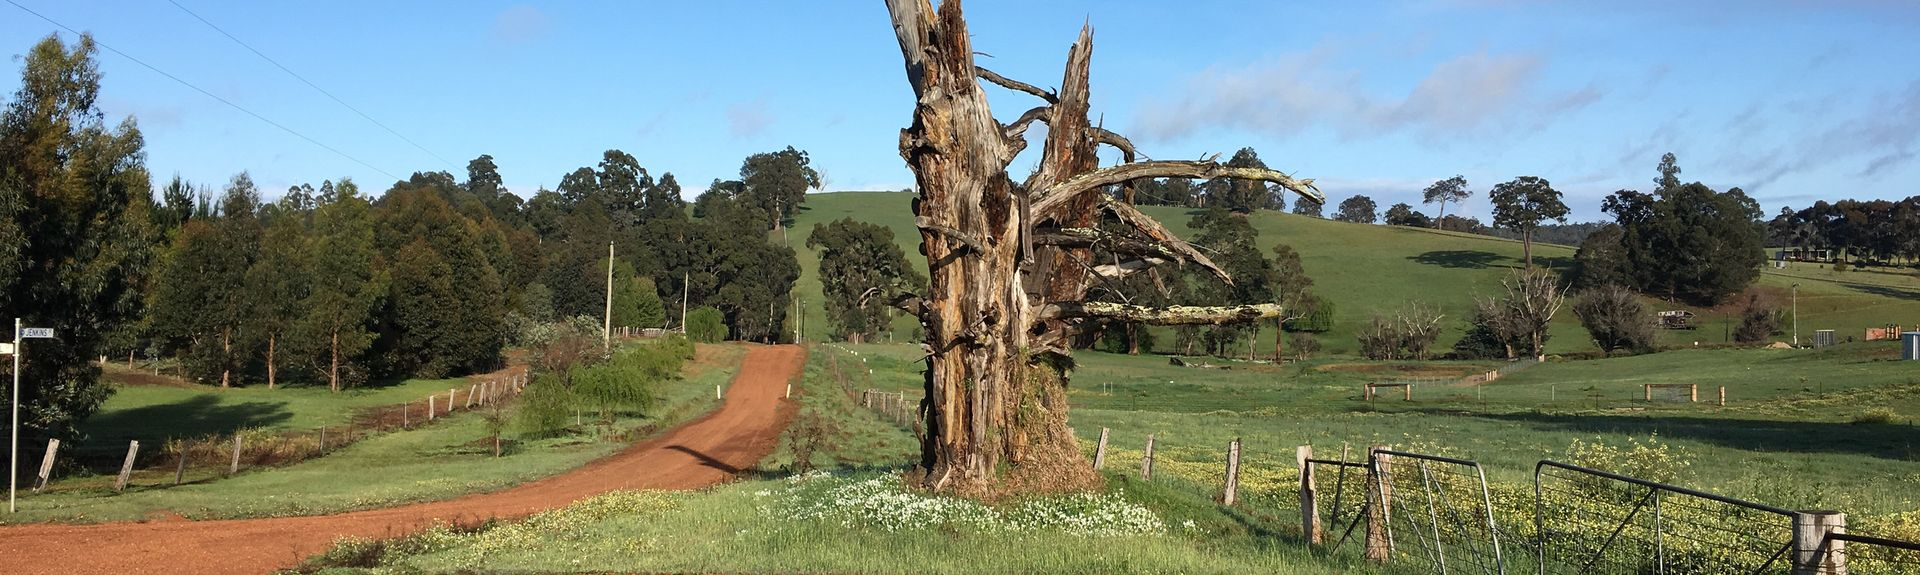 Barton Jones Wines, Upper Capel, Western Australia, Australia